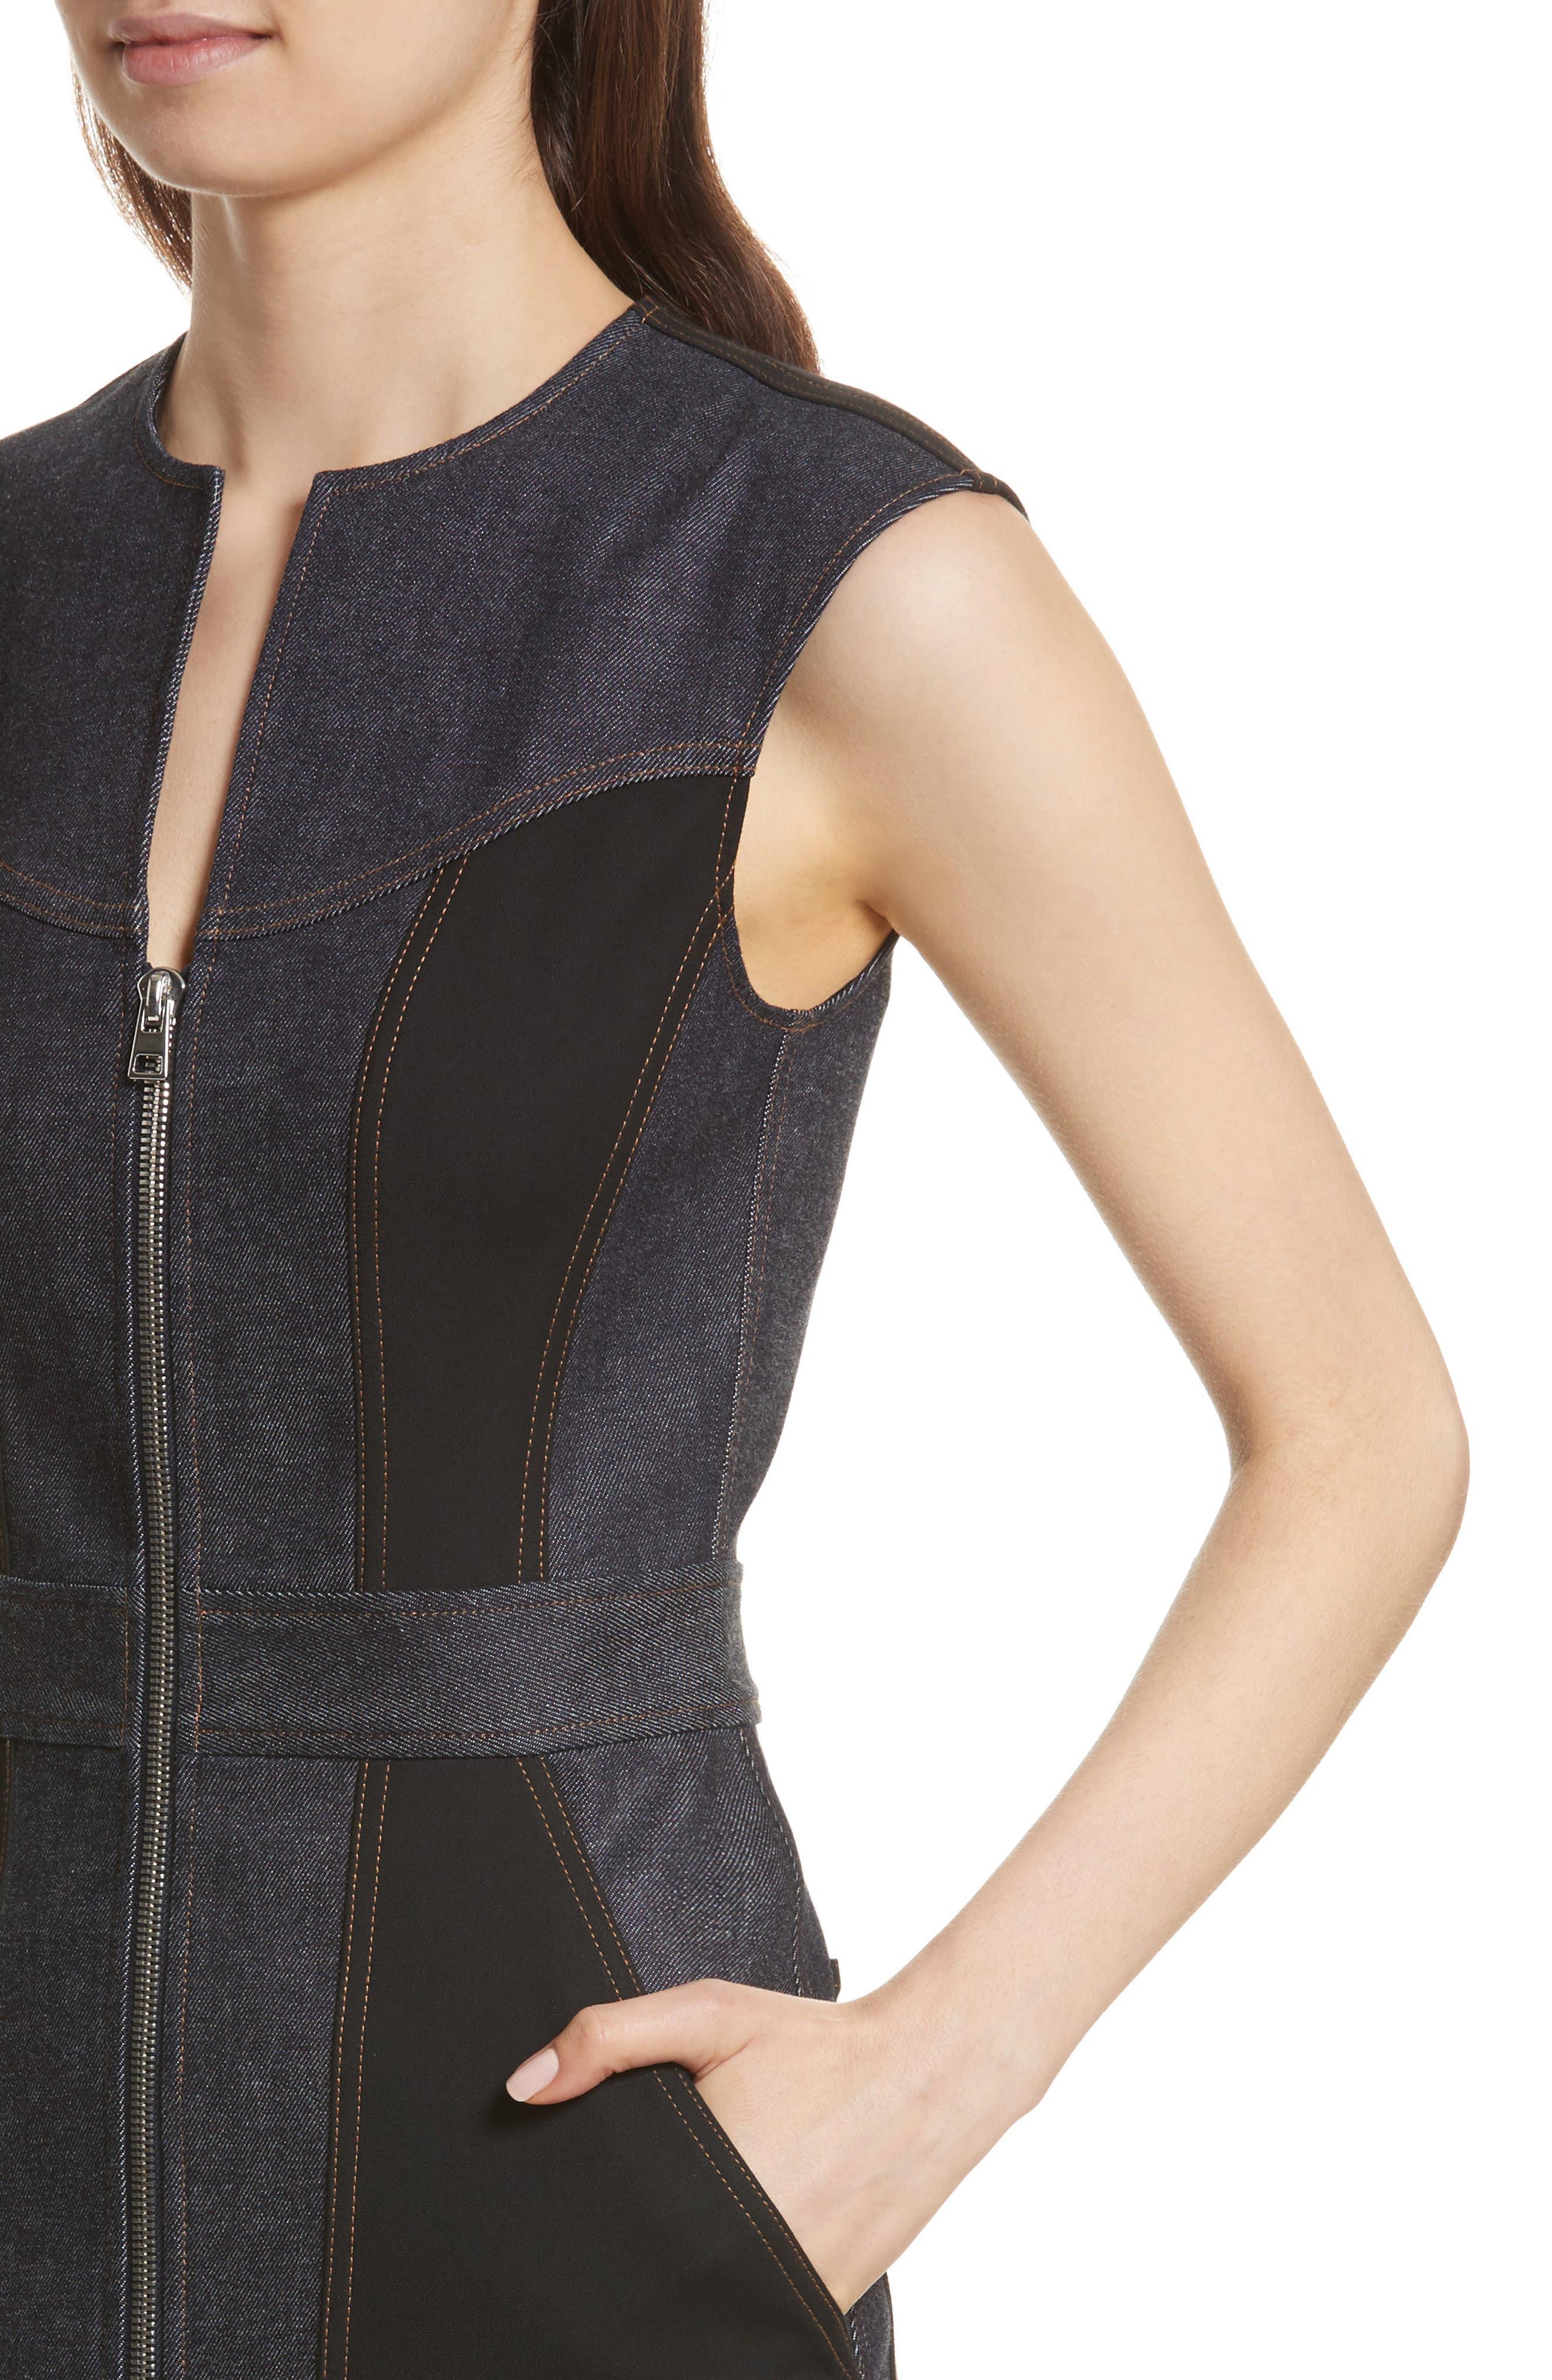 Diane von Furstenberg Front Zip Denim Dress,                             Alternate thumbnail 4, color,